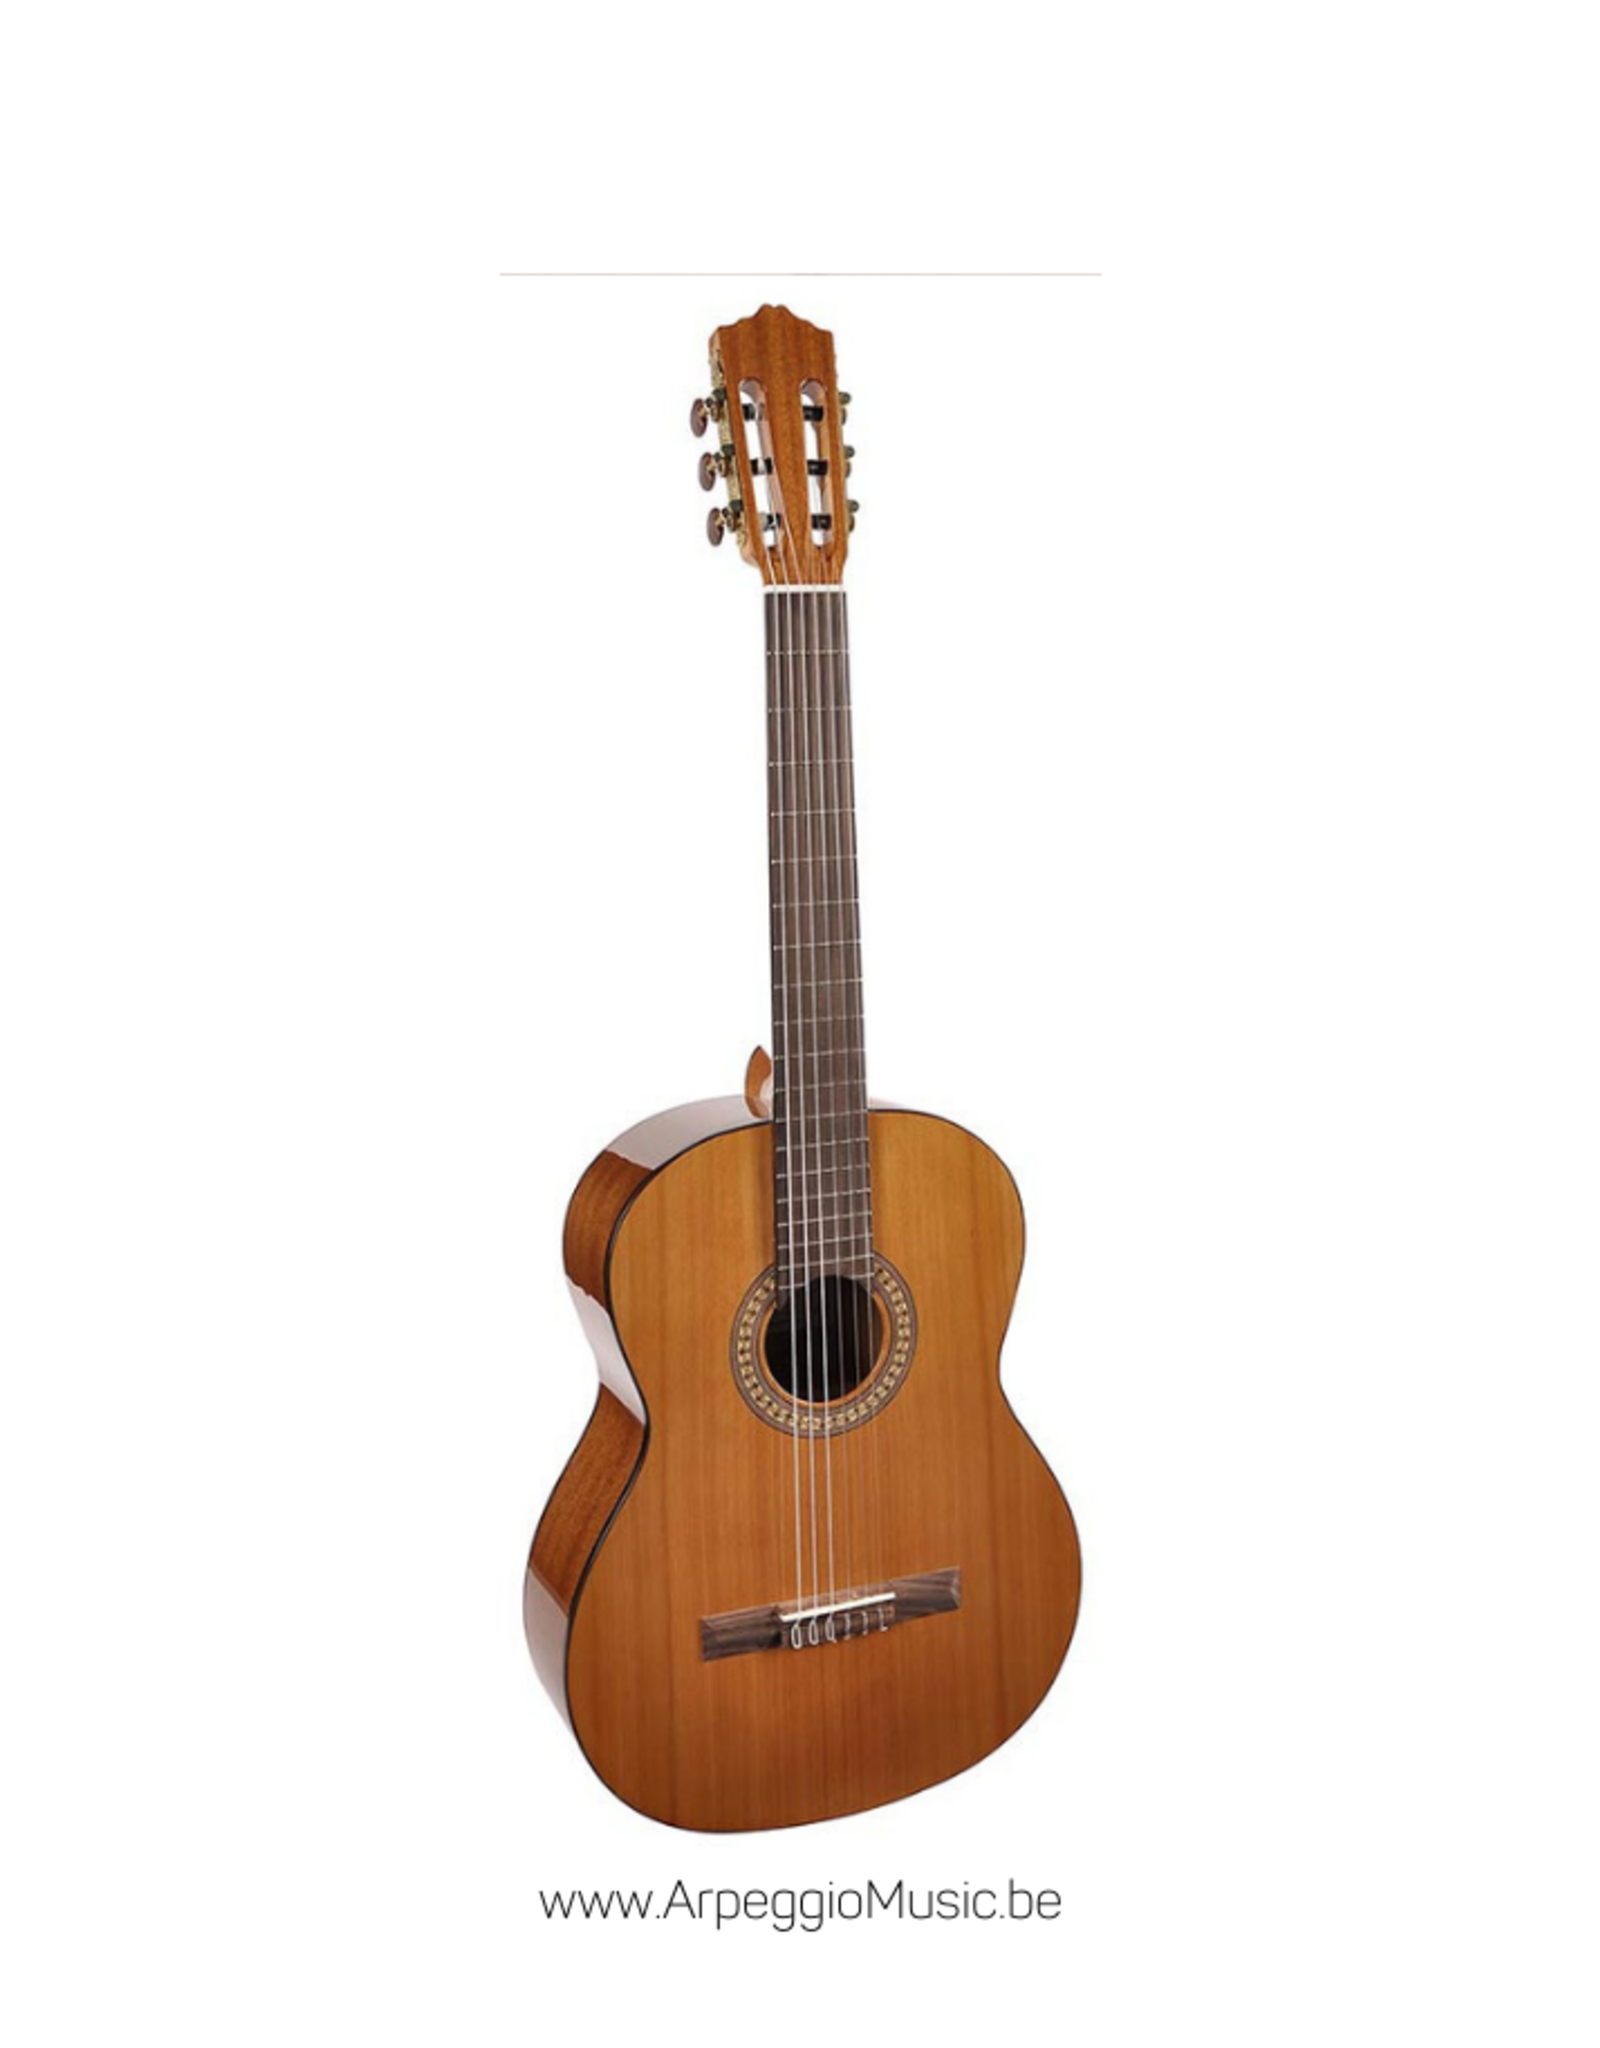 SALVADOR CORTEZ CC-22 Solid Top Artist Series klassieke gitaar, 1/2 bambino